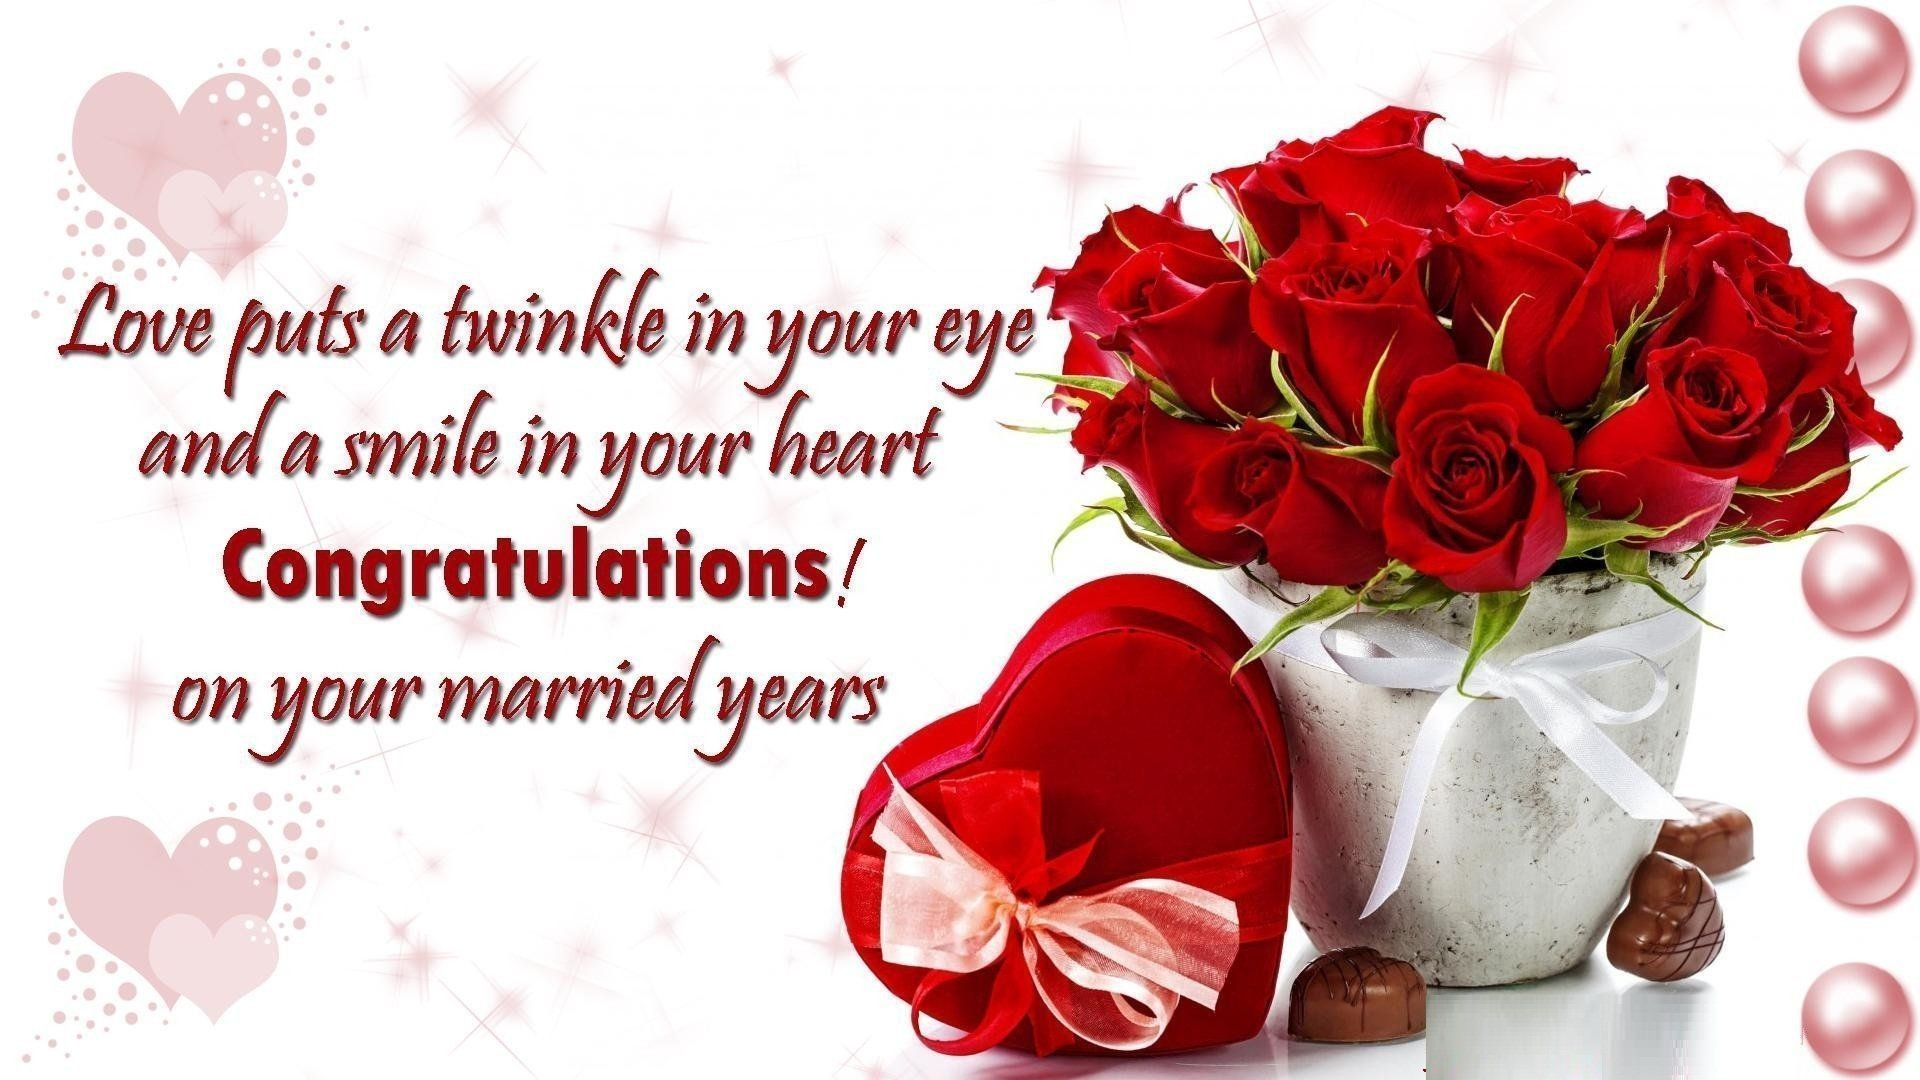 wedding anniversary card download free